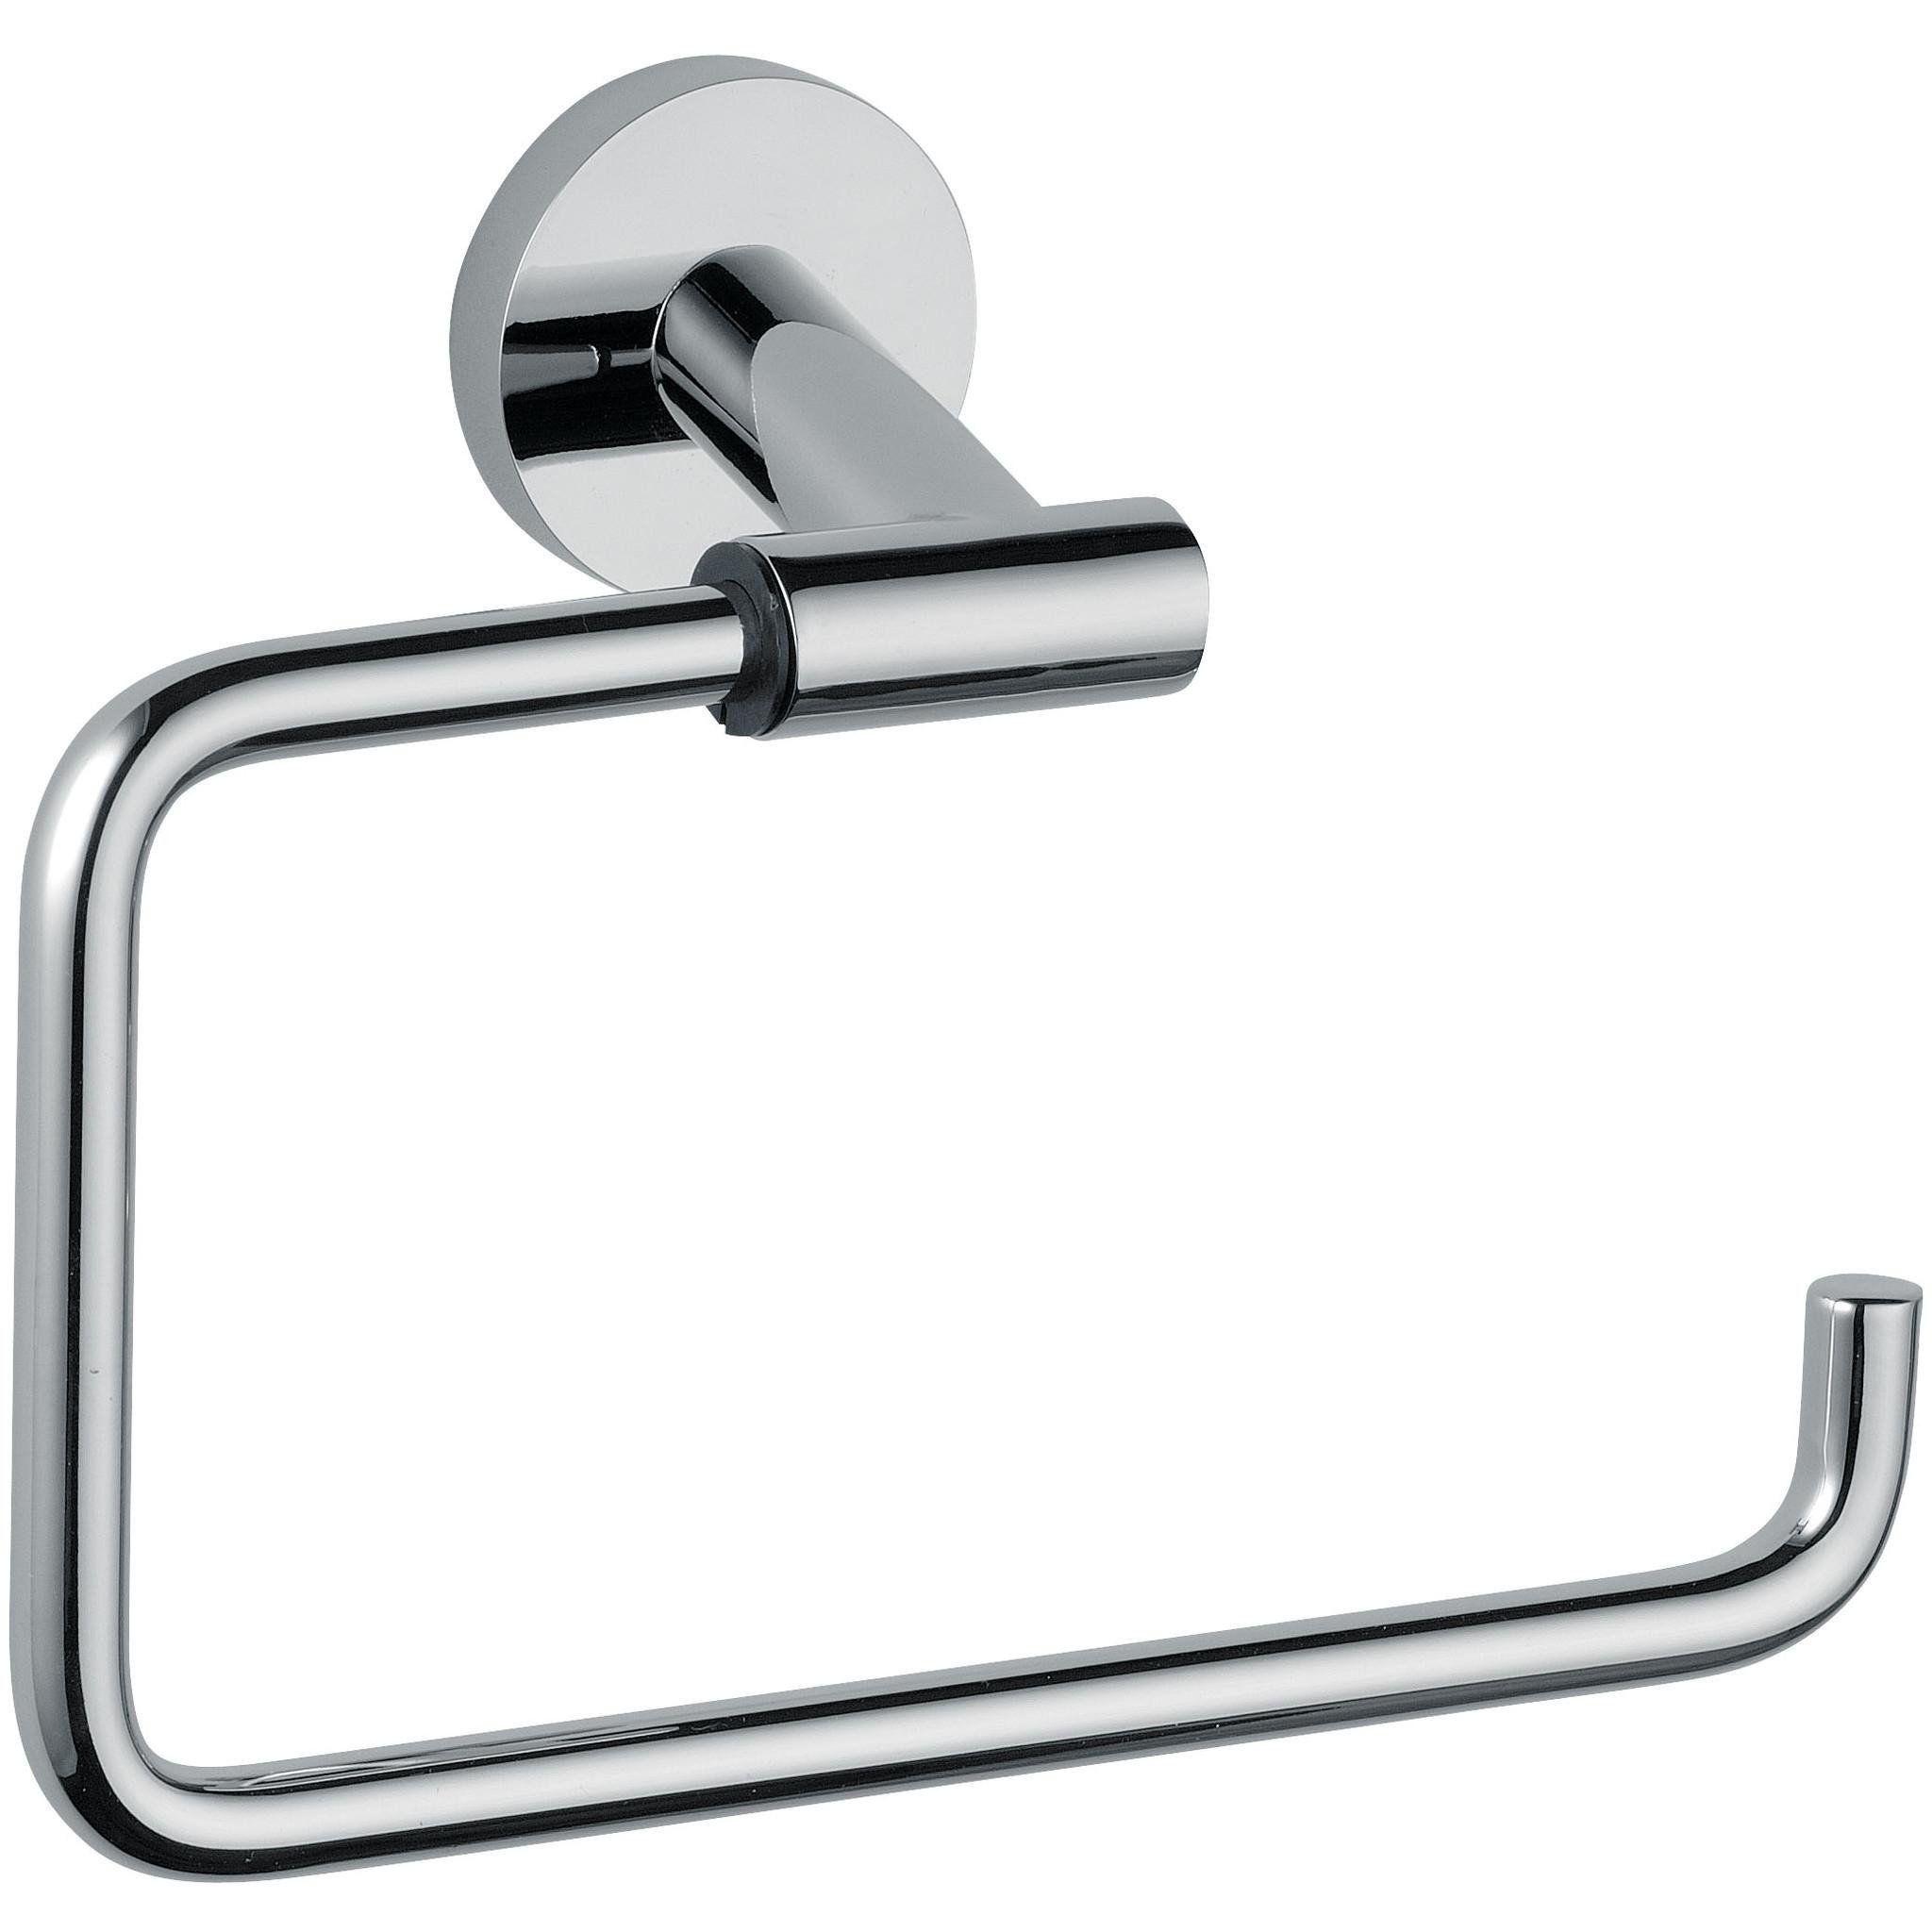 Di Hilton Round Towel Ring Holder Bath Hand Towel Holder Hanging Brass Chrome Towel Rings Towel Holder Towel Holder Bathroom